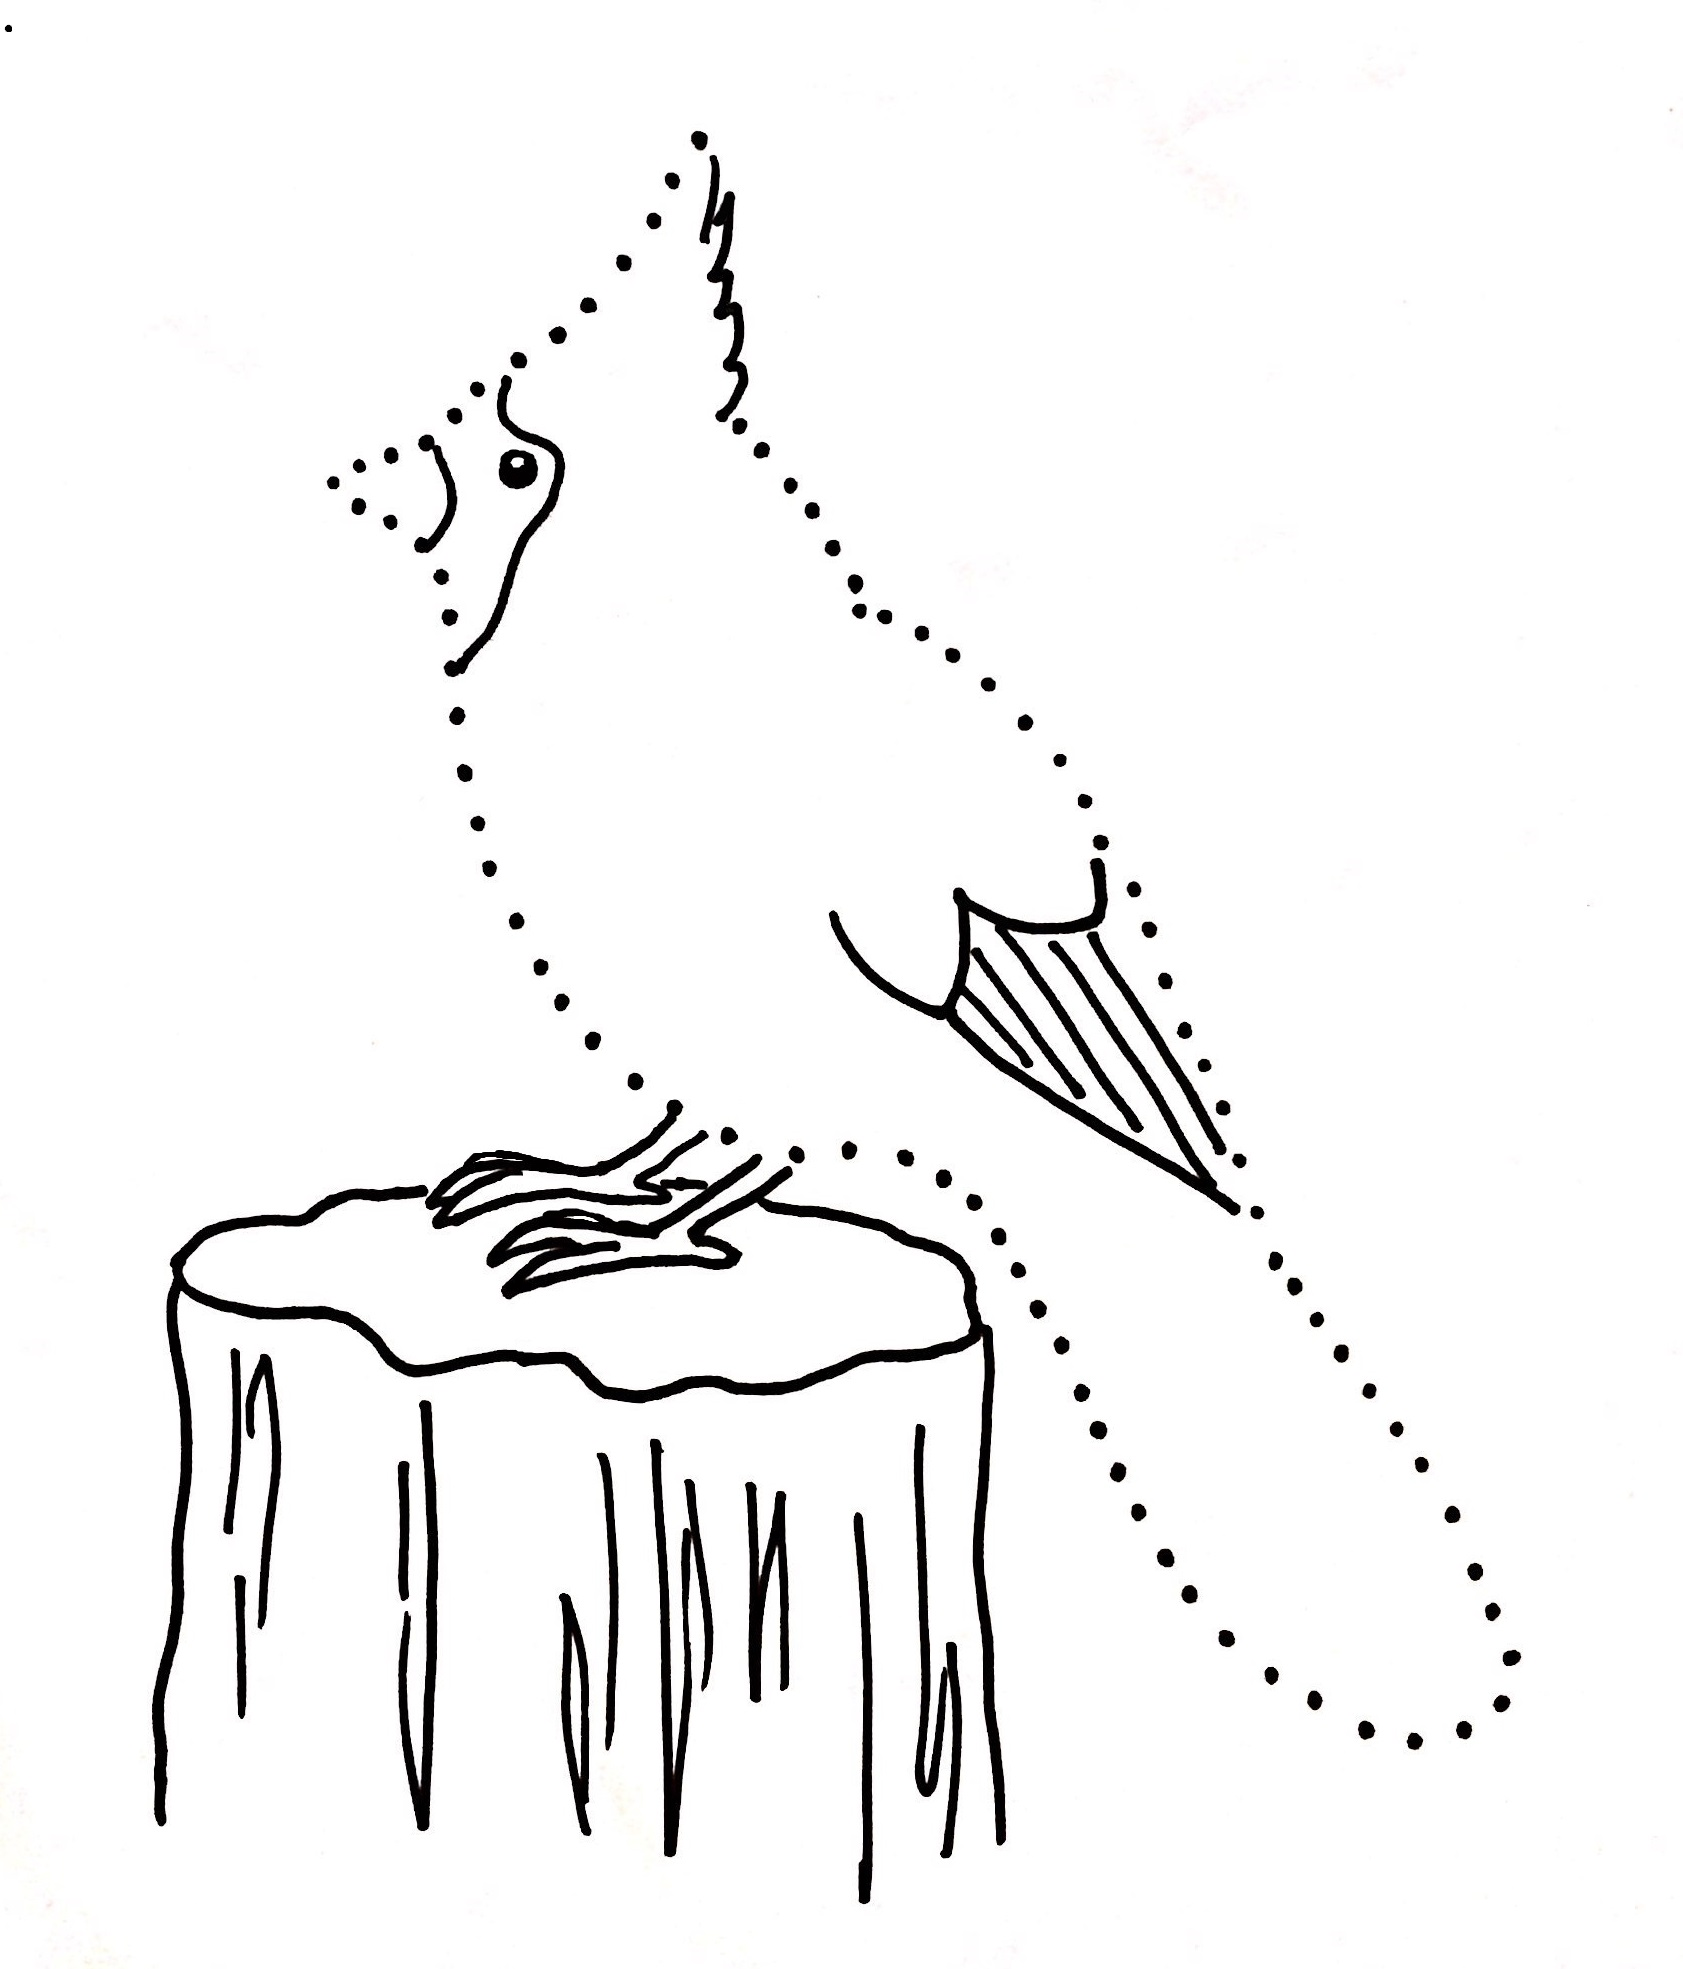 Dot Drawings